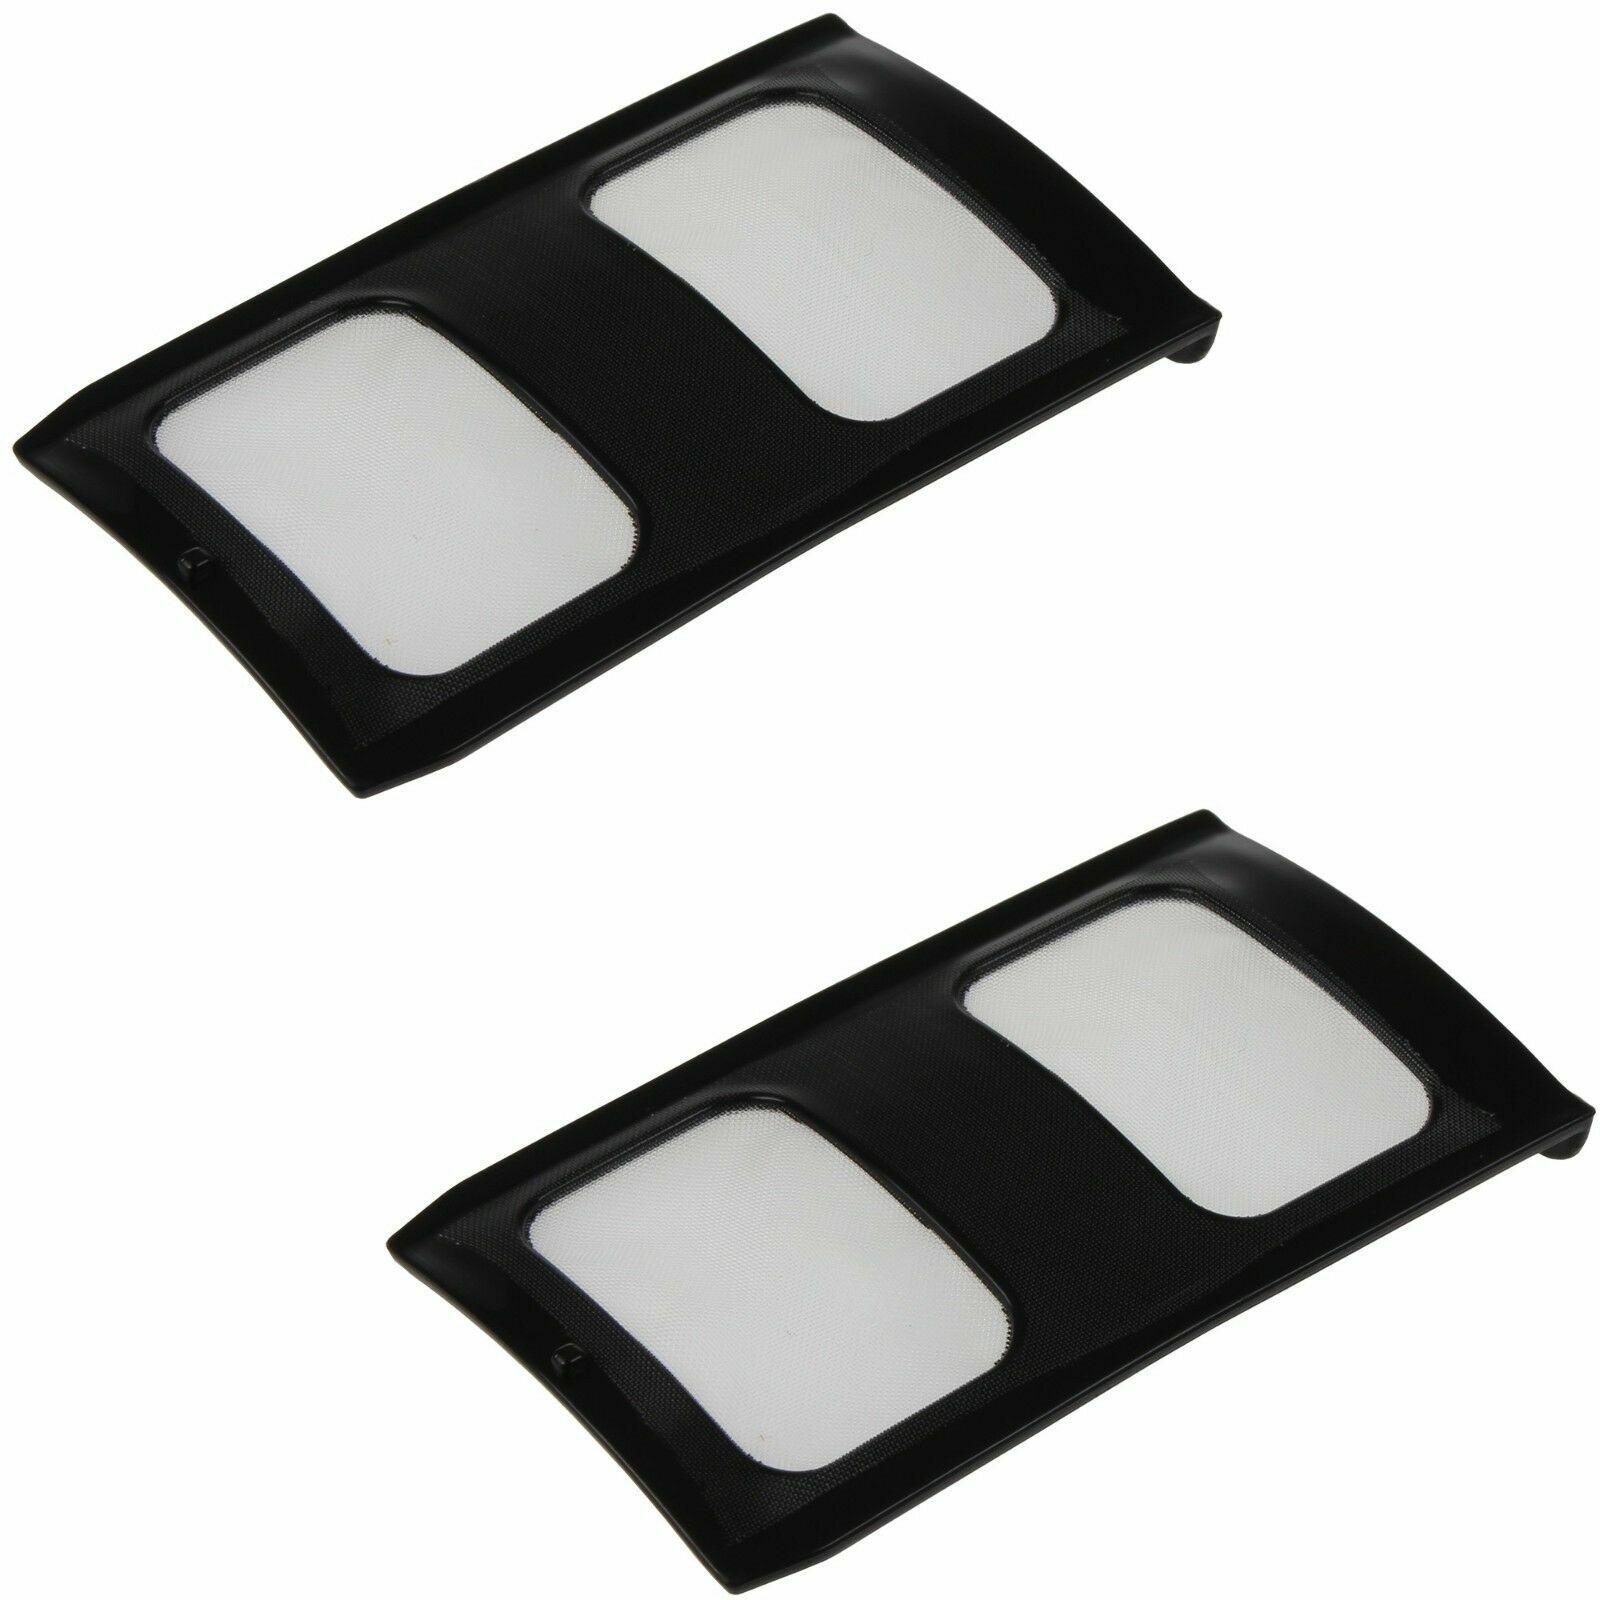 MORPHY RICHARDS Kettle Spout Filter